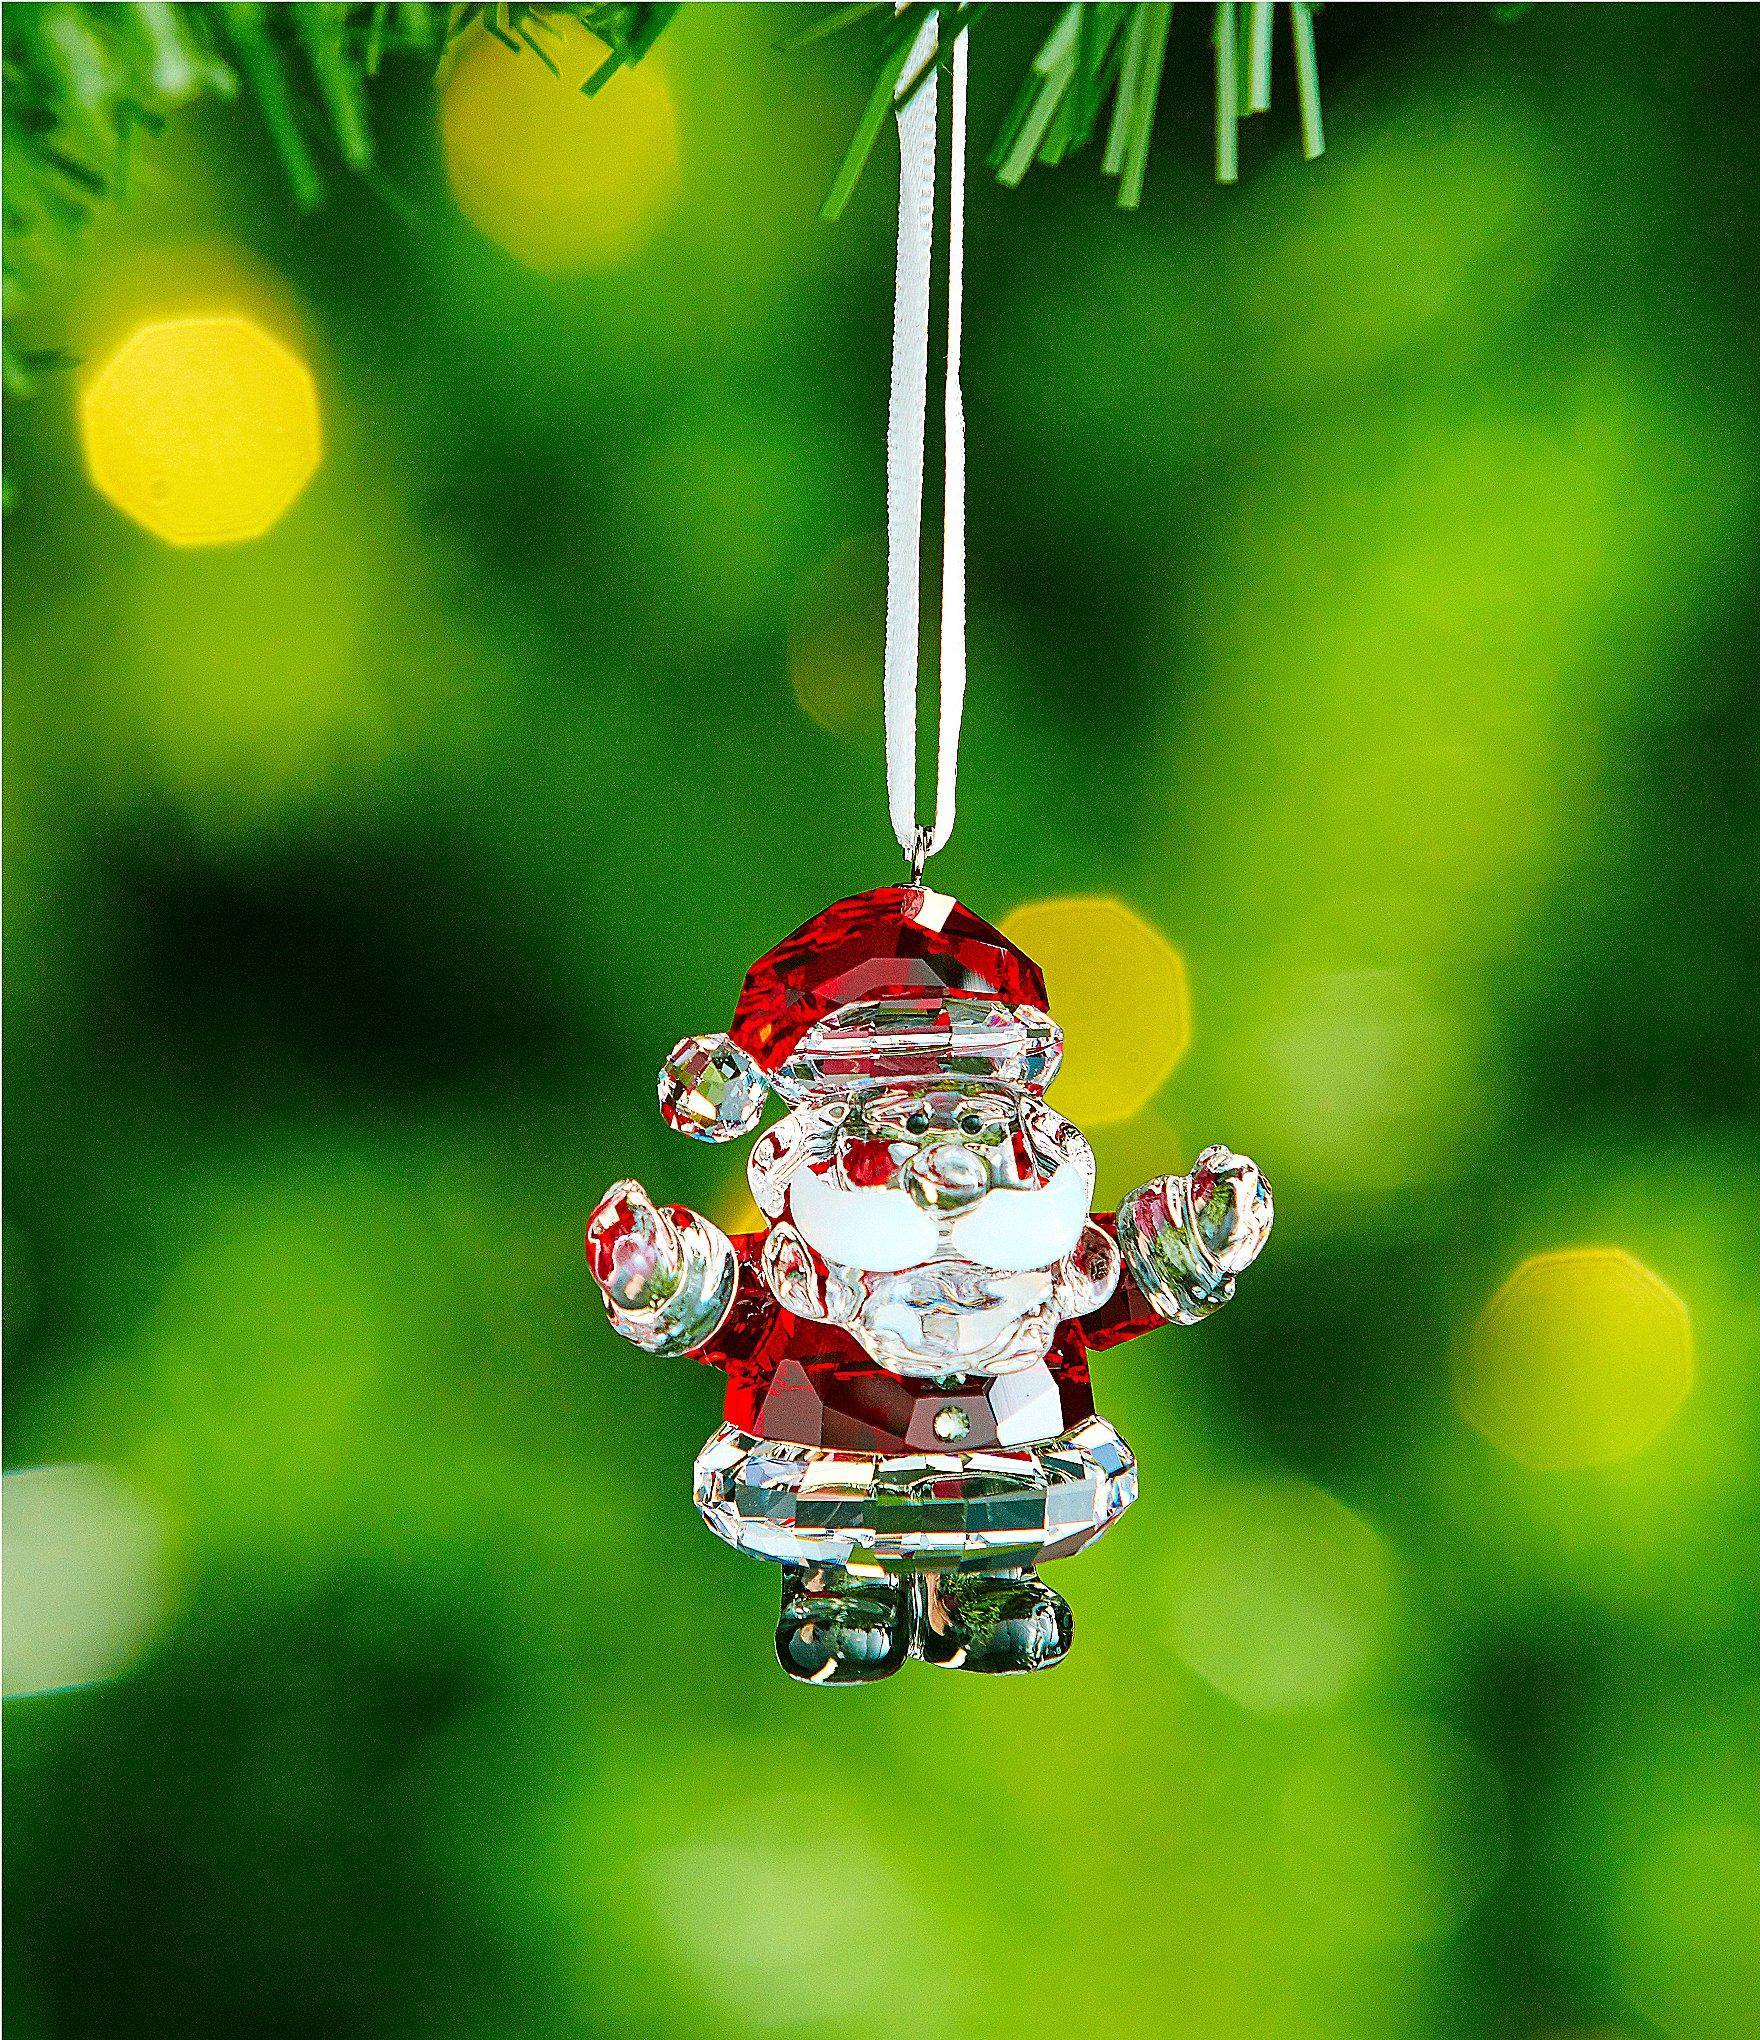 Swarovski Crystal Santa Claus Ornament Dillards